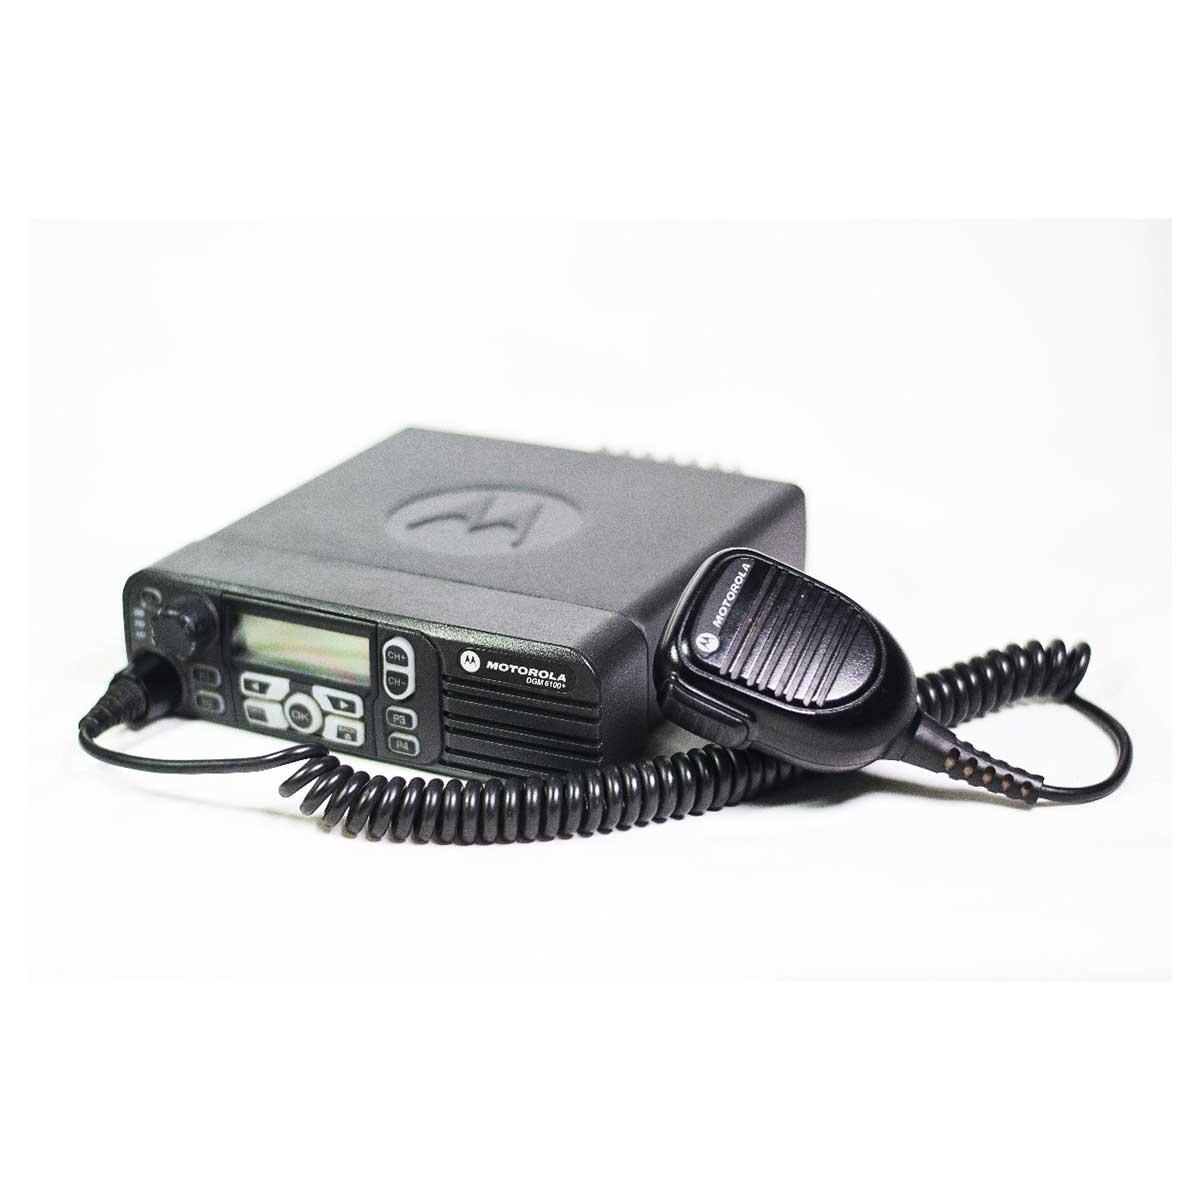 Radio Motorola DGM6100 Digital LAM27JDH9LA1AN VHF 136-174 MHz